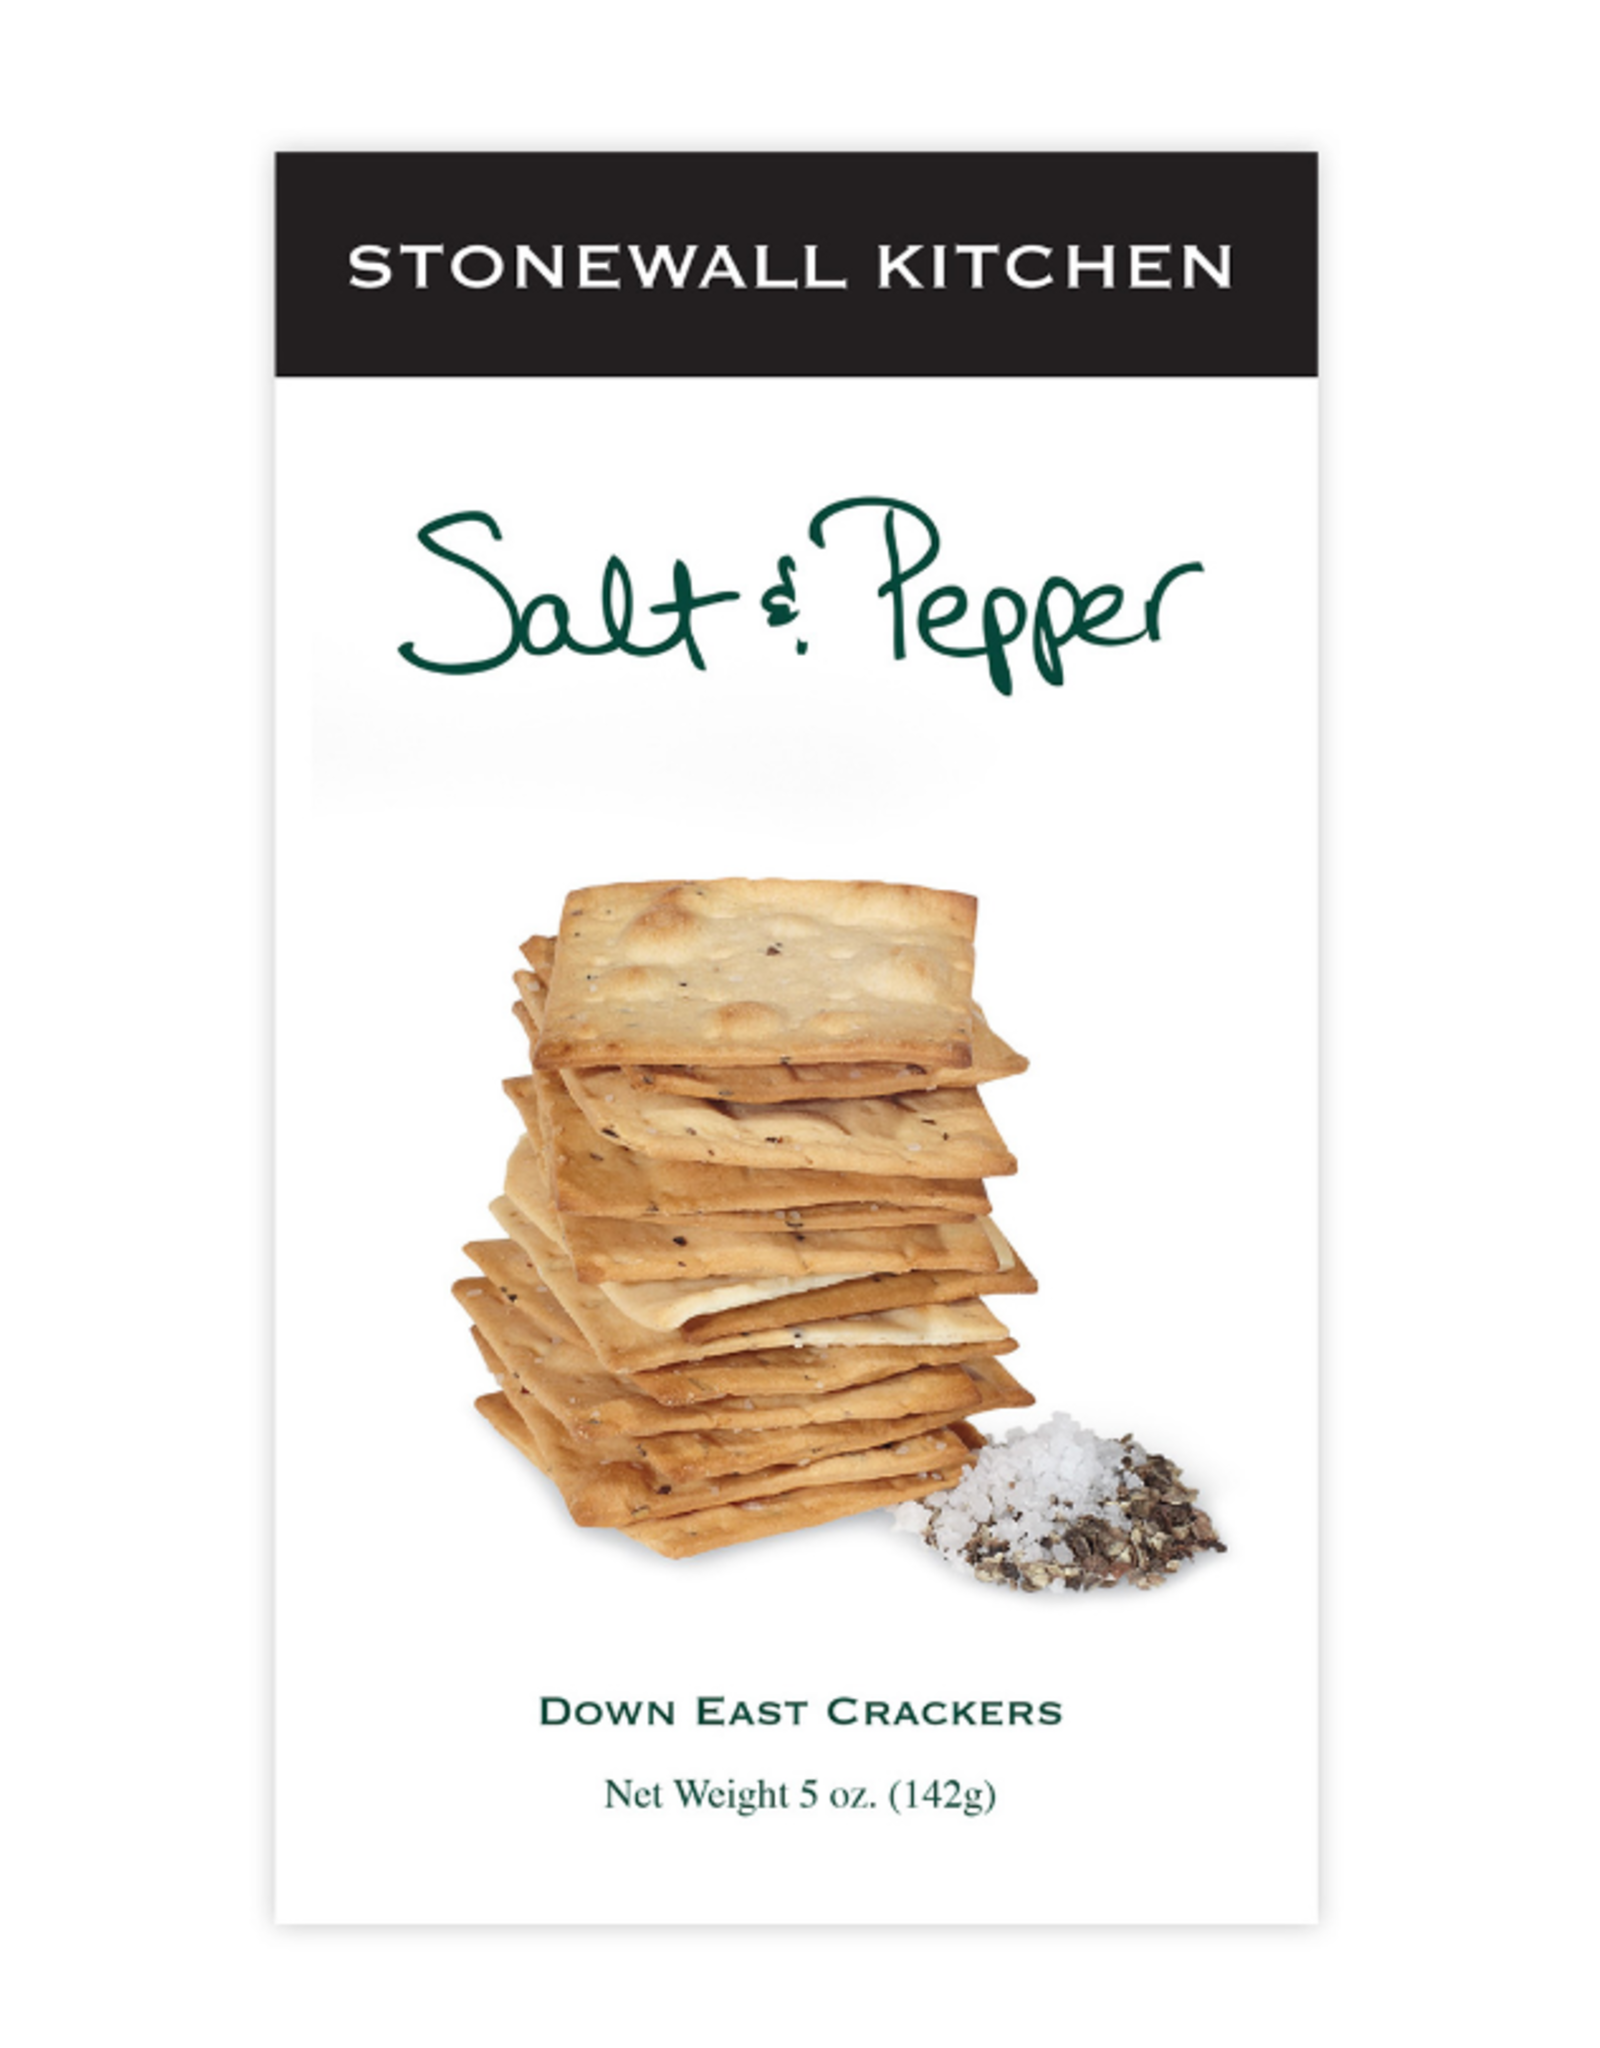 Stonewall Kitchen Down East Sea Salt & Pepper Crackers